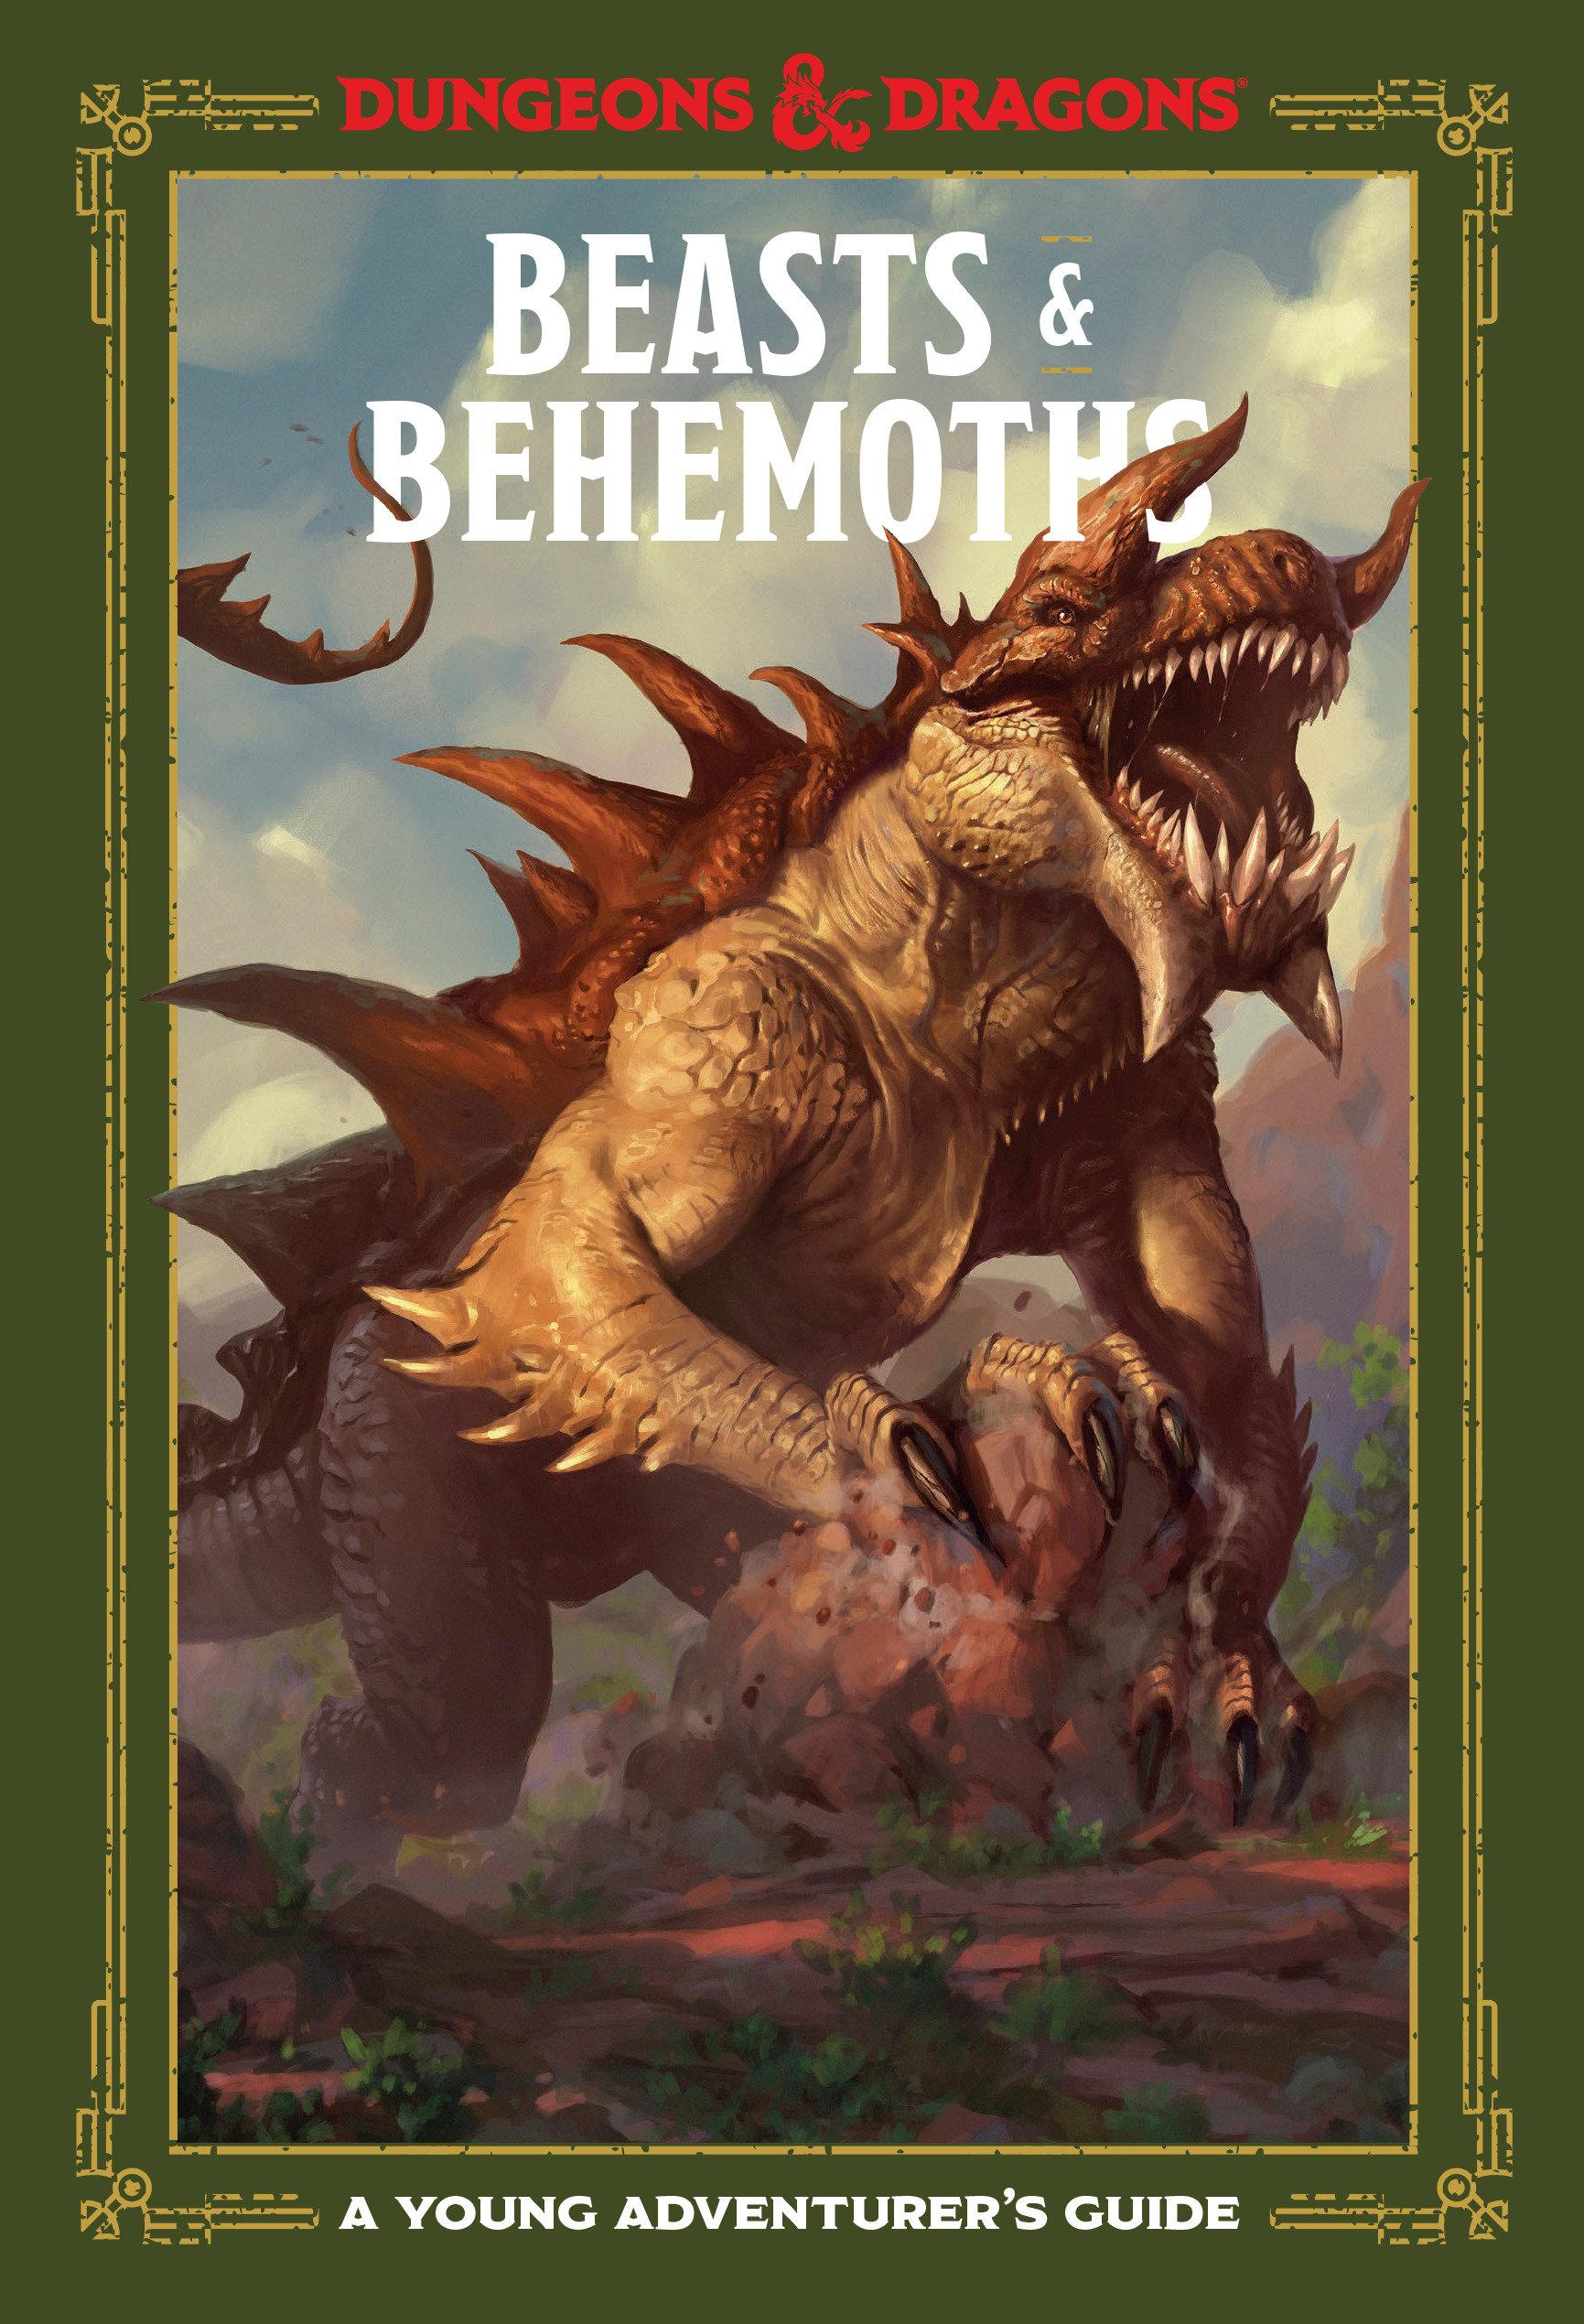 Beasts & Behemoths (Dungeons & Dragons) A Young Adventurer's Guide